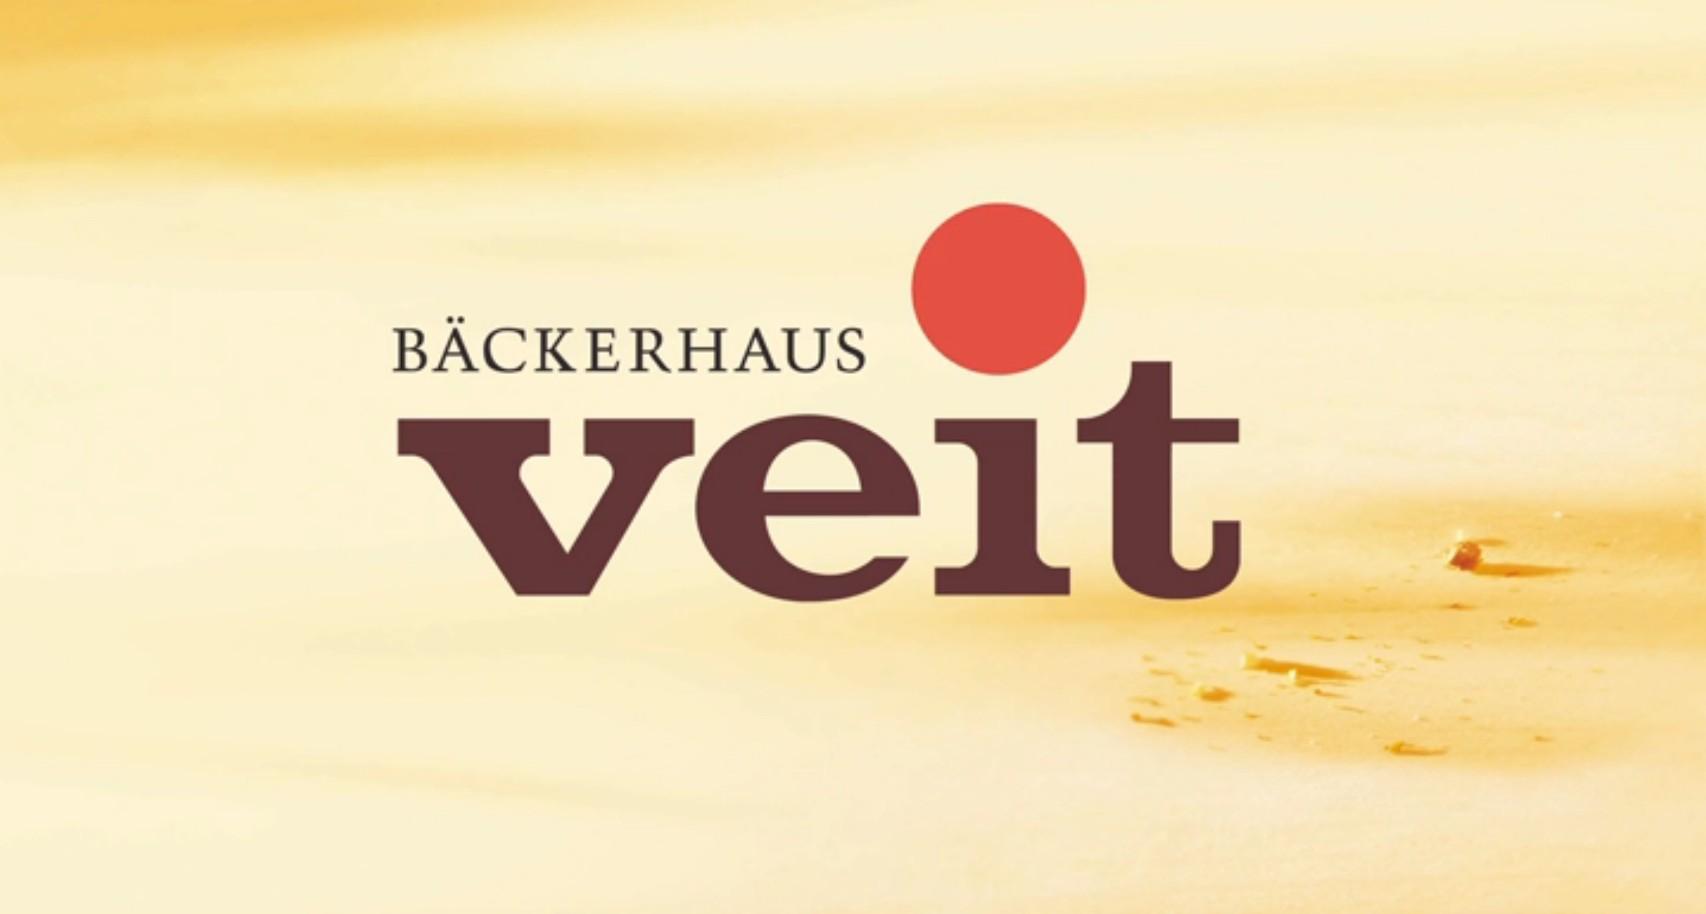 Bäckerhaus Veit Imagefilm